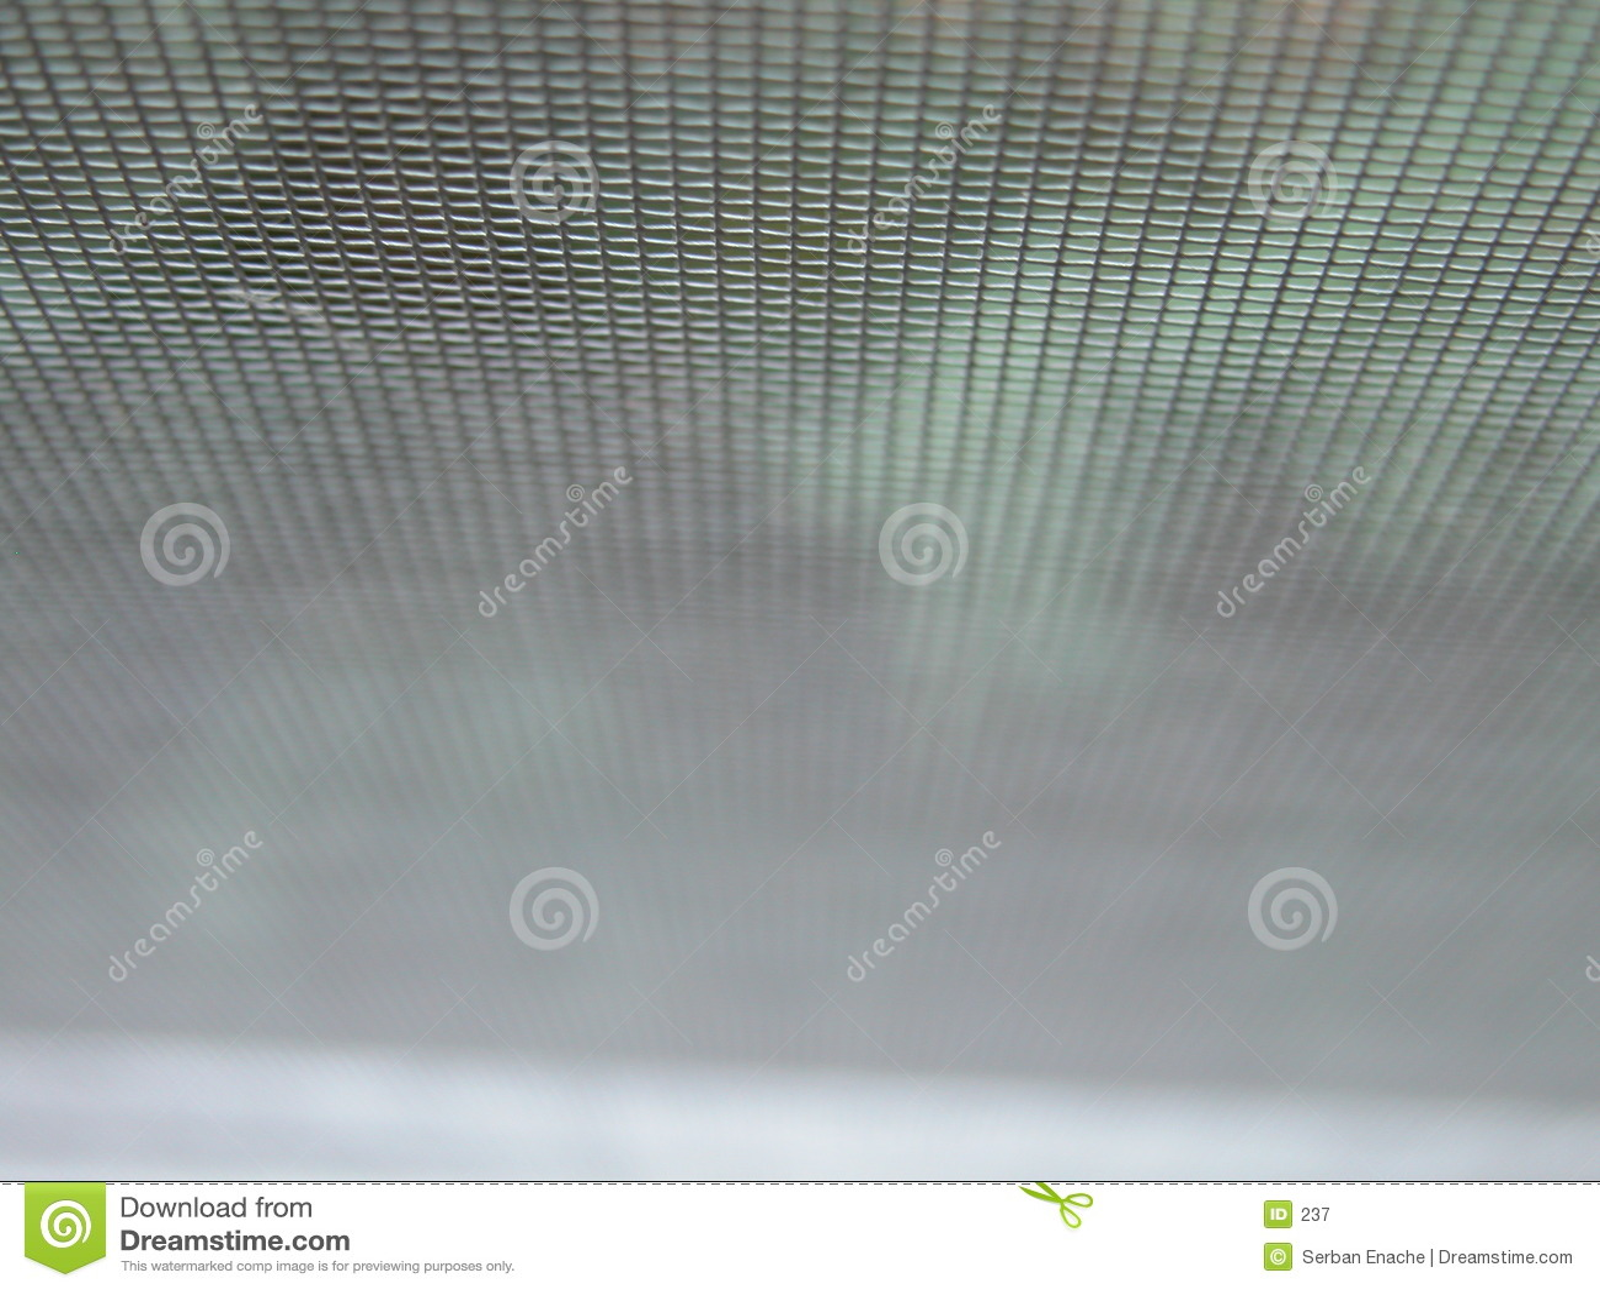 Detalle de una red de alambre